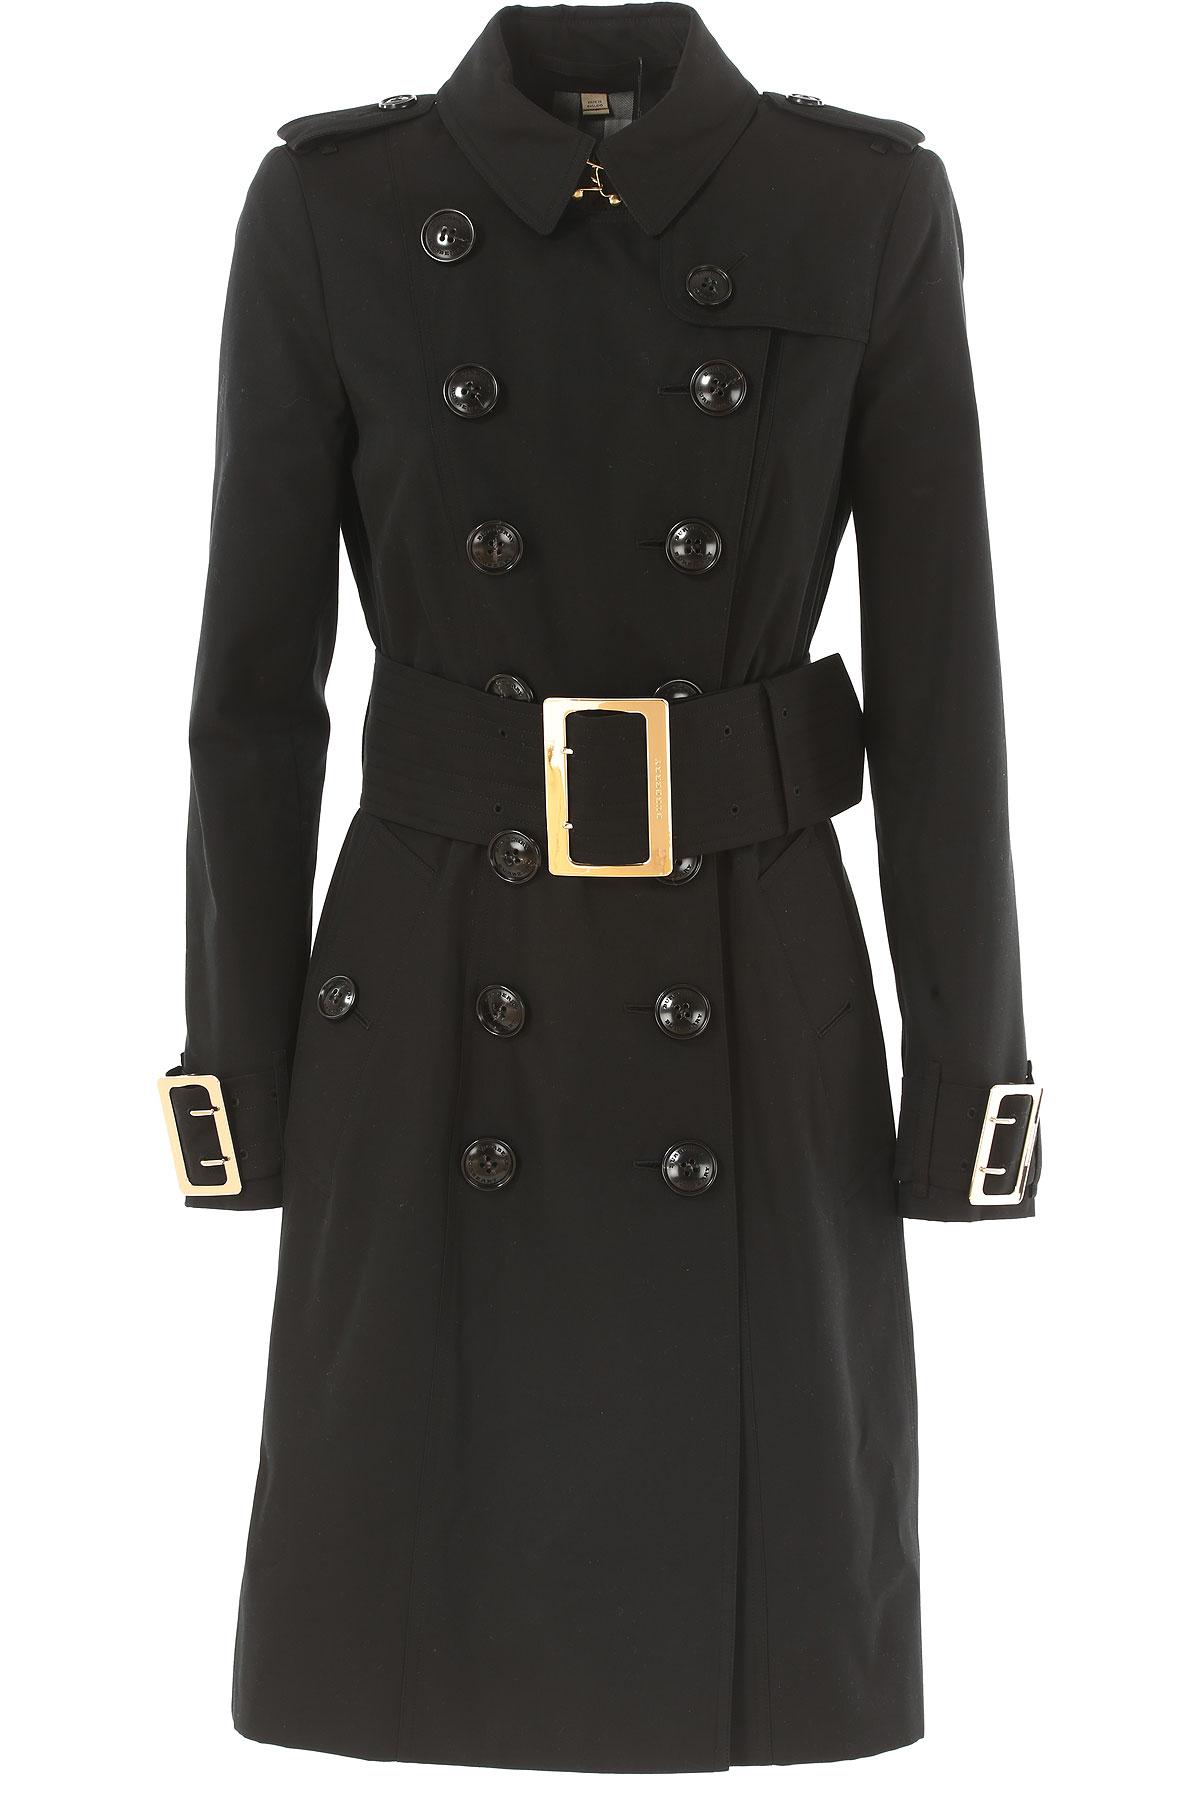 Womens Coat On Sale, Denim, Cotton, 2017, UK 6 - US 4 - EU 38 UK 8 - US 6 - EU 40 UK 10 - US 8 - EU 42 Burberry